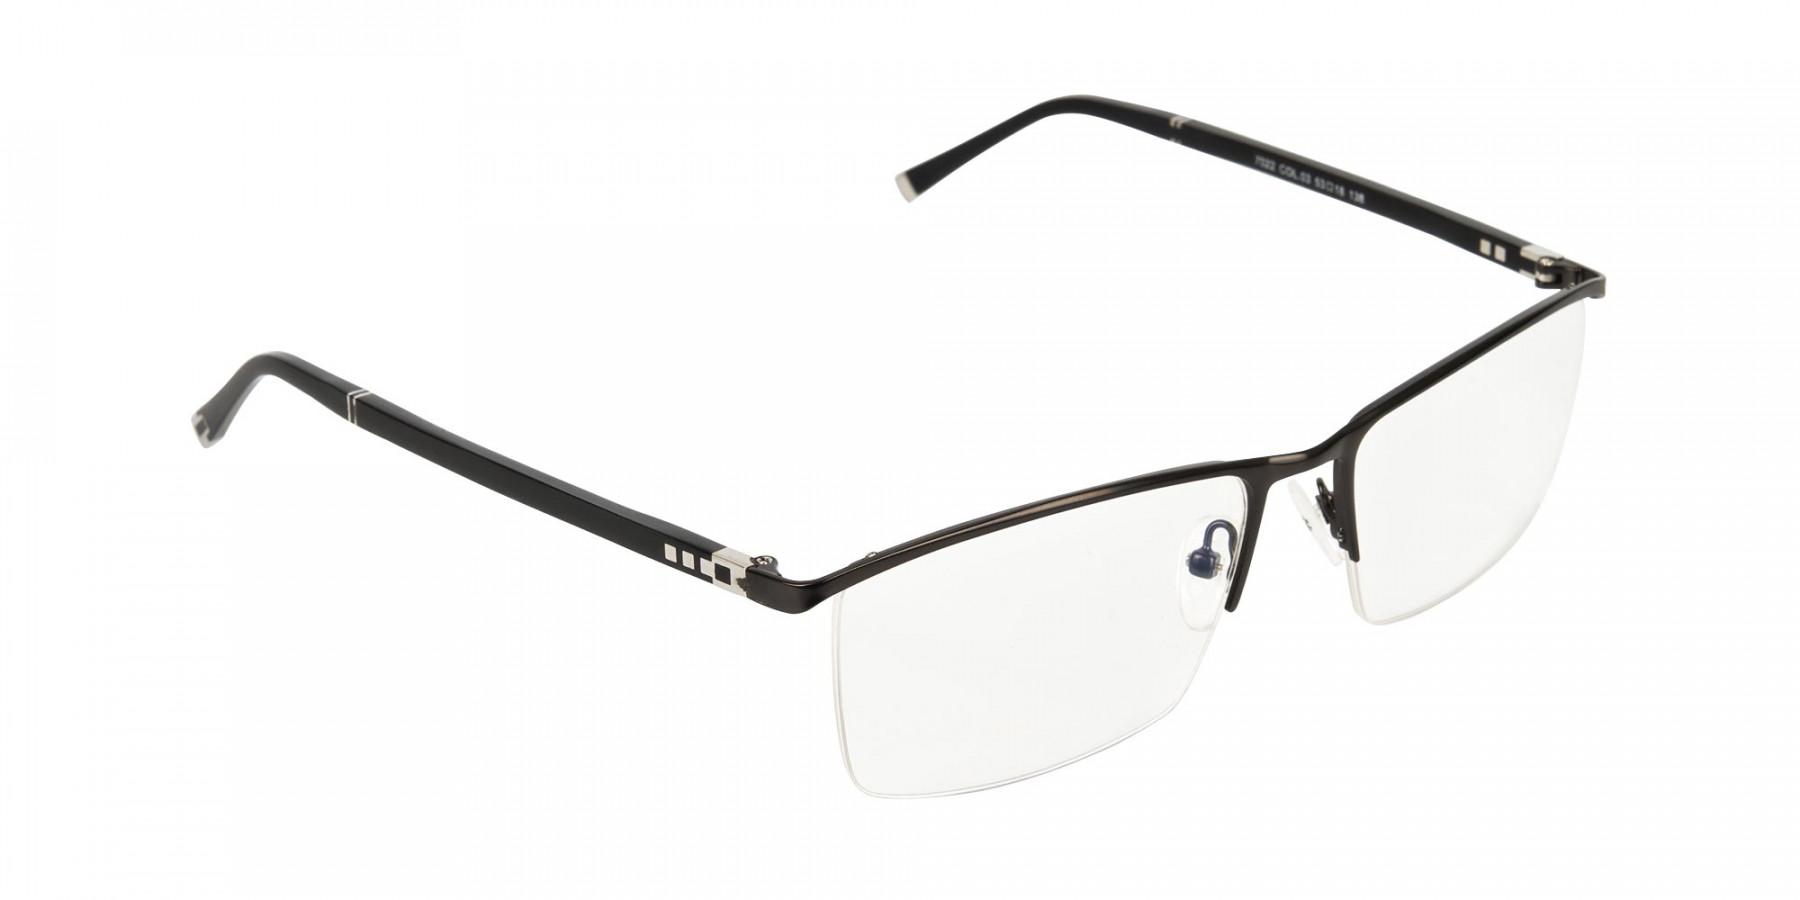 Black Semi-Rimless Glasses in Rectangular-1